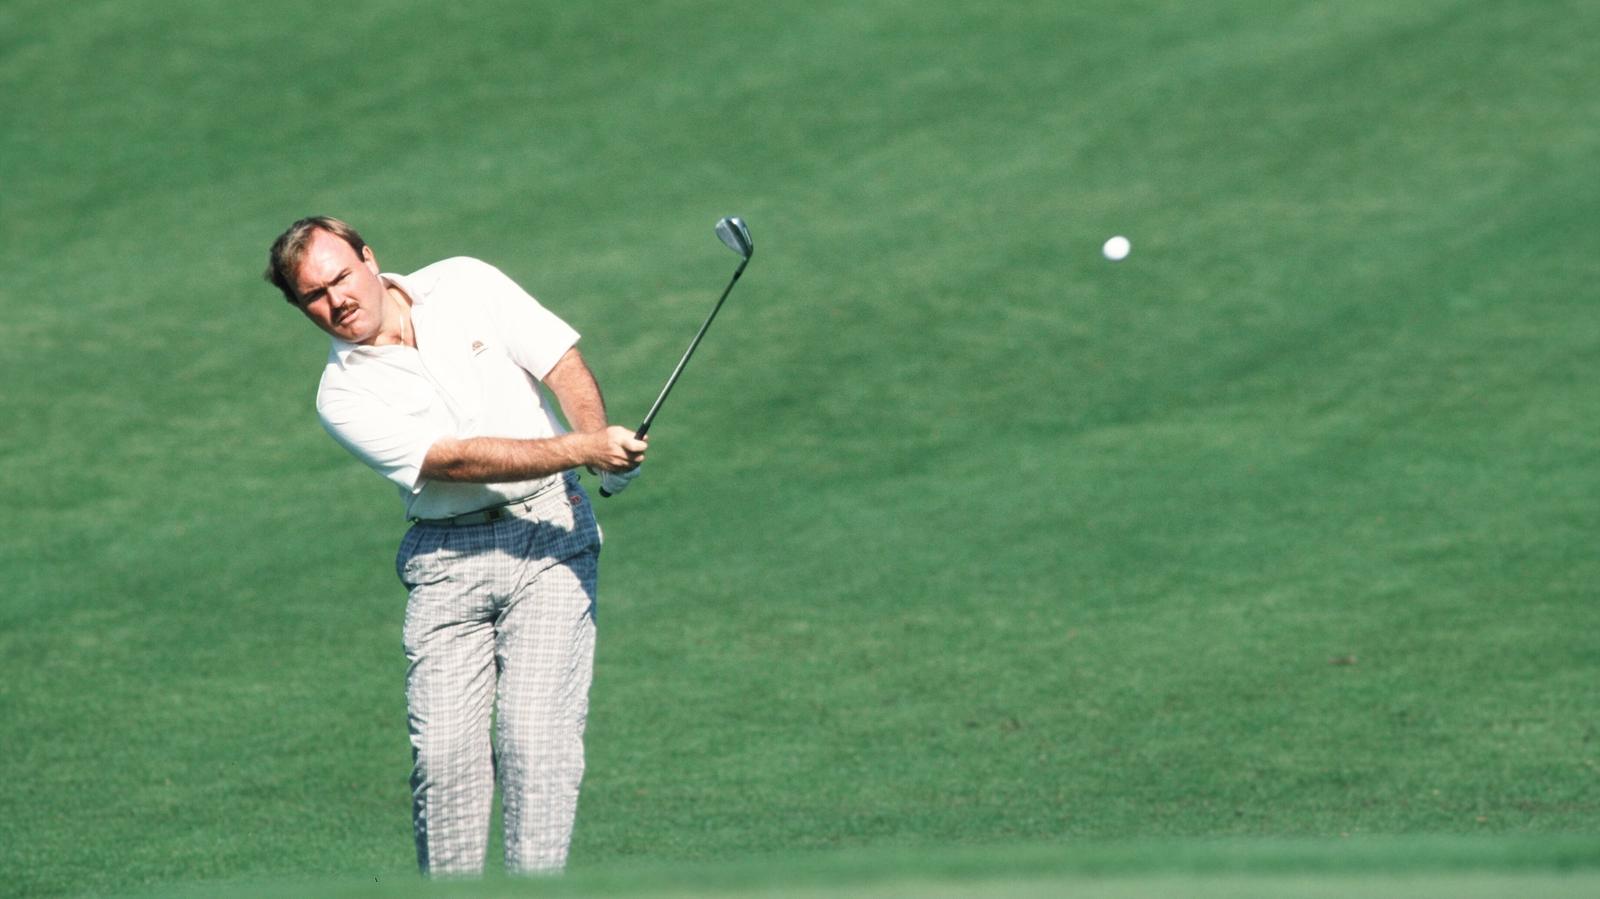 Image - Ronan Rafferty playing the Masters in 1990